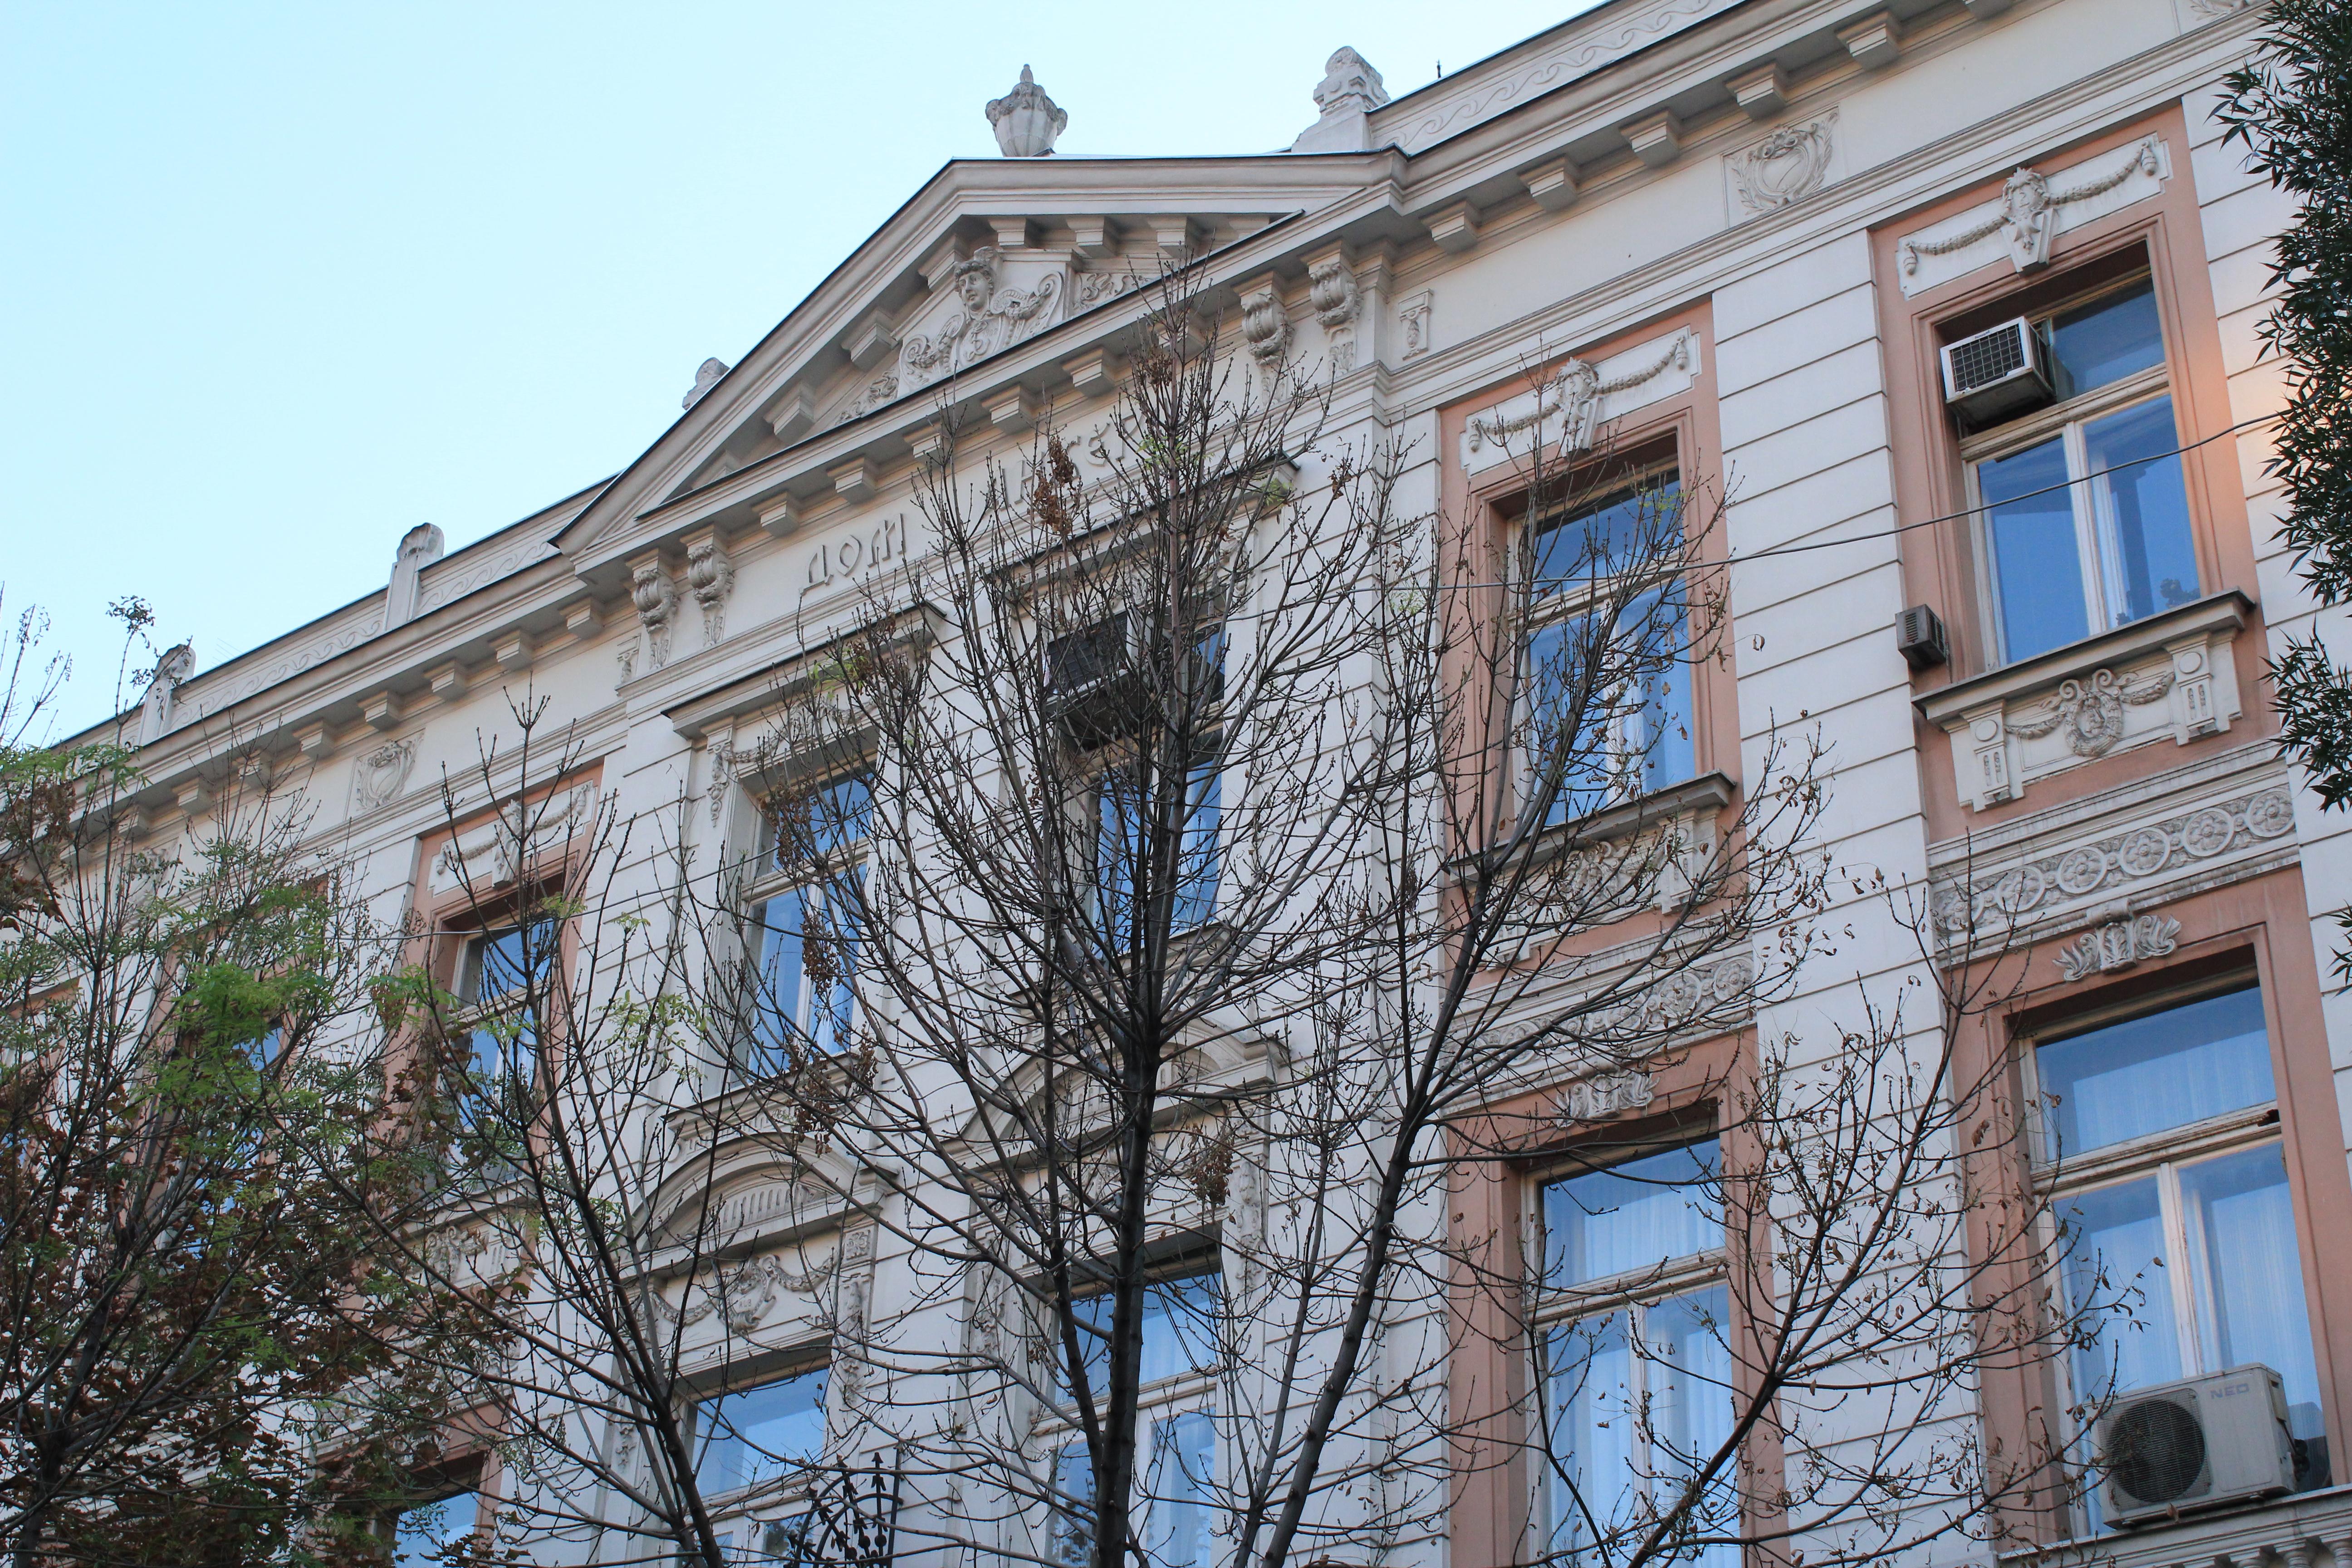 Znamenite gradjevine grada Beograda Palata_%E2%80%9EAnker%E2%80%9C_2